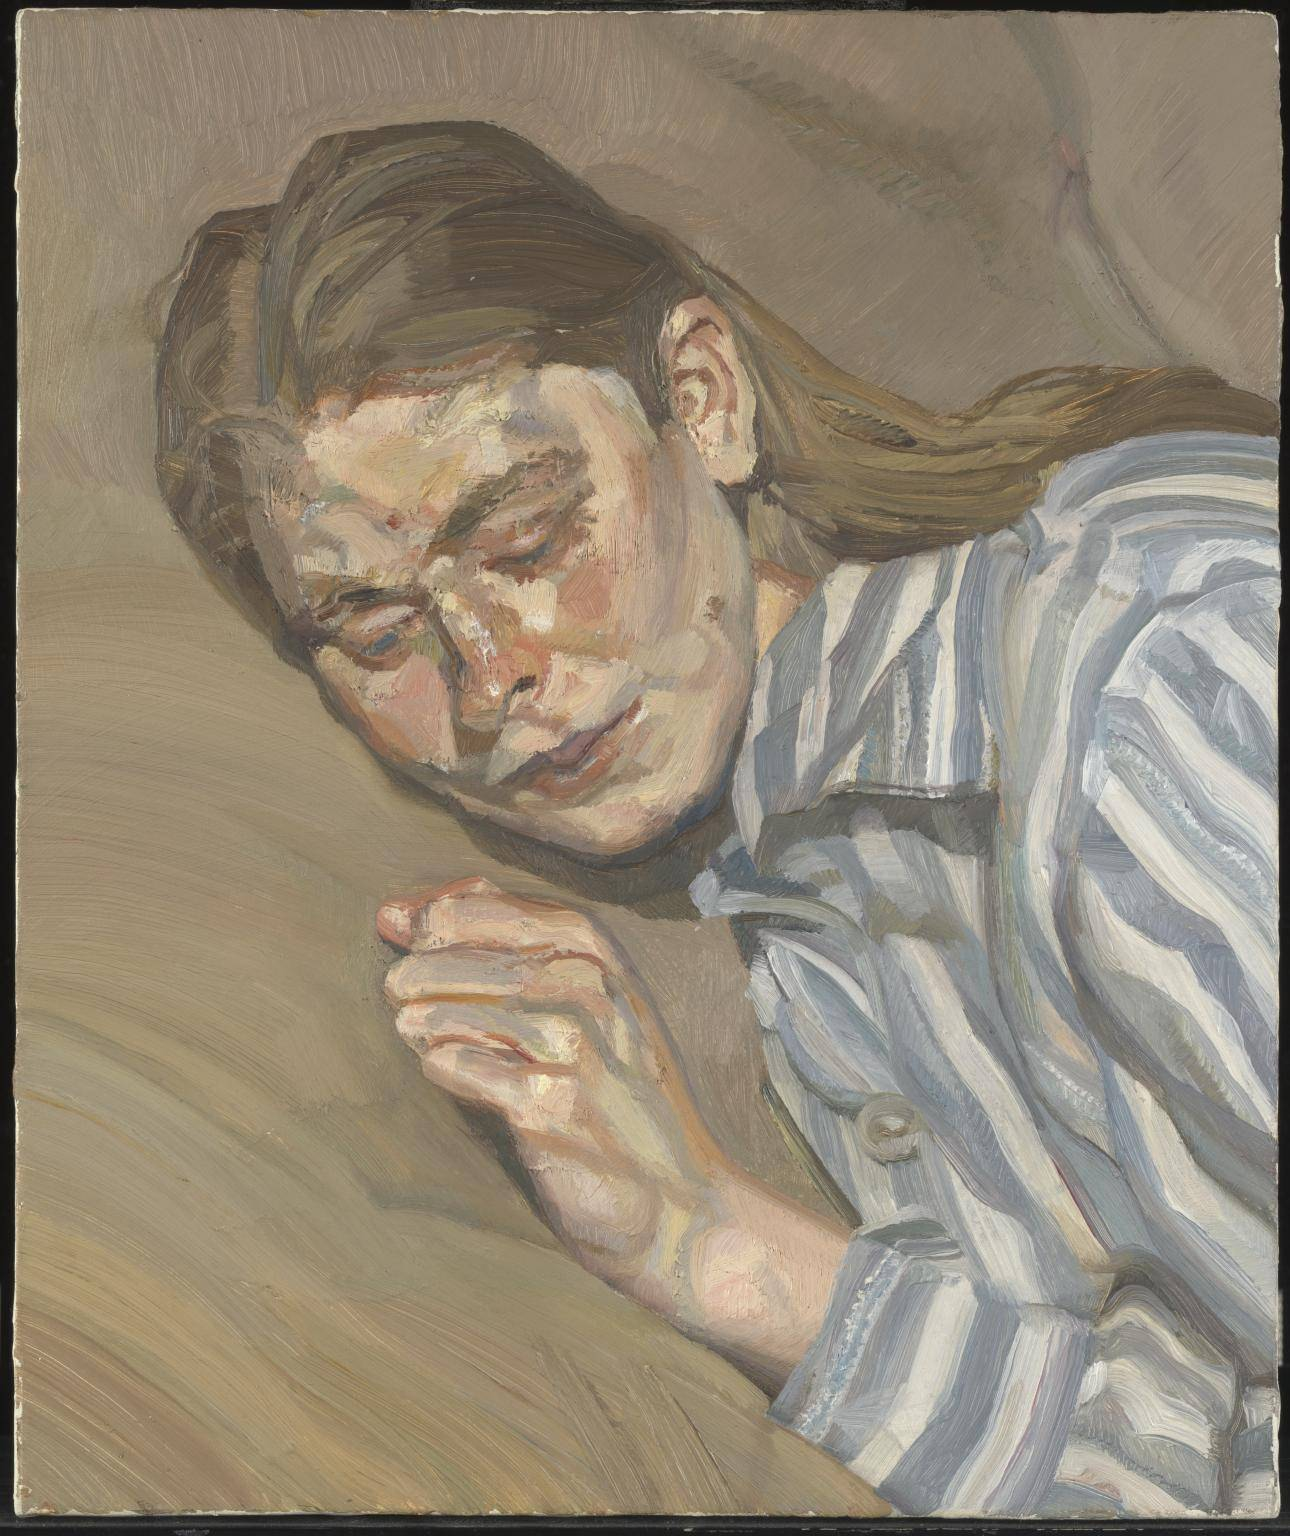 Люсьен Фрейд. Девушка в полосатой пижаме, 1983-1985. Масло, Холст. Галерея Тейт